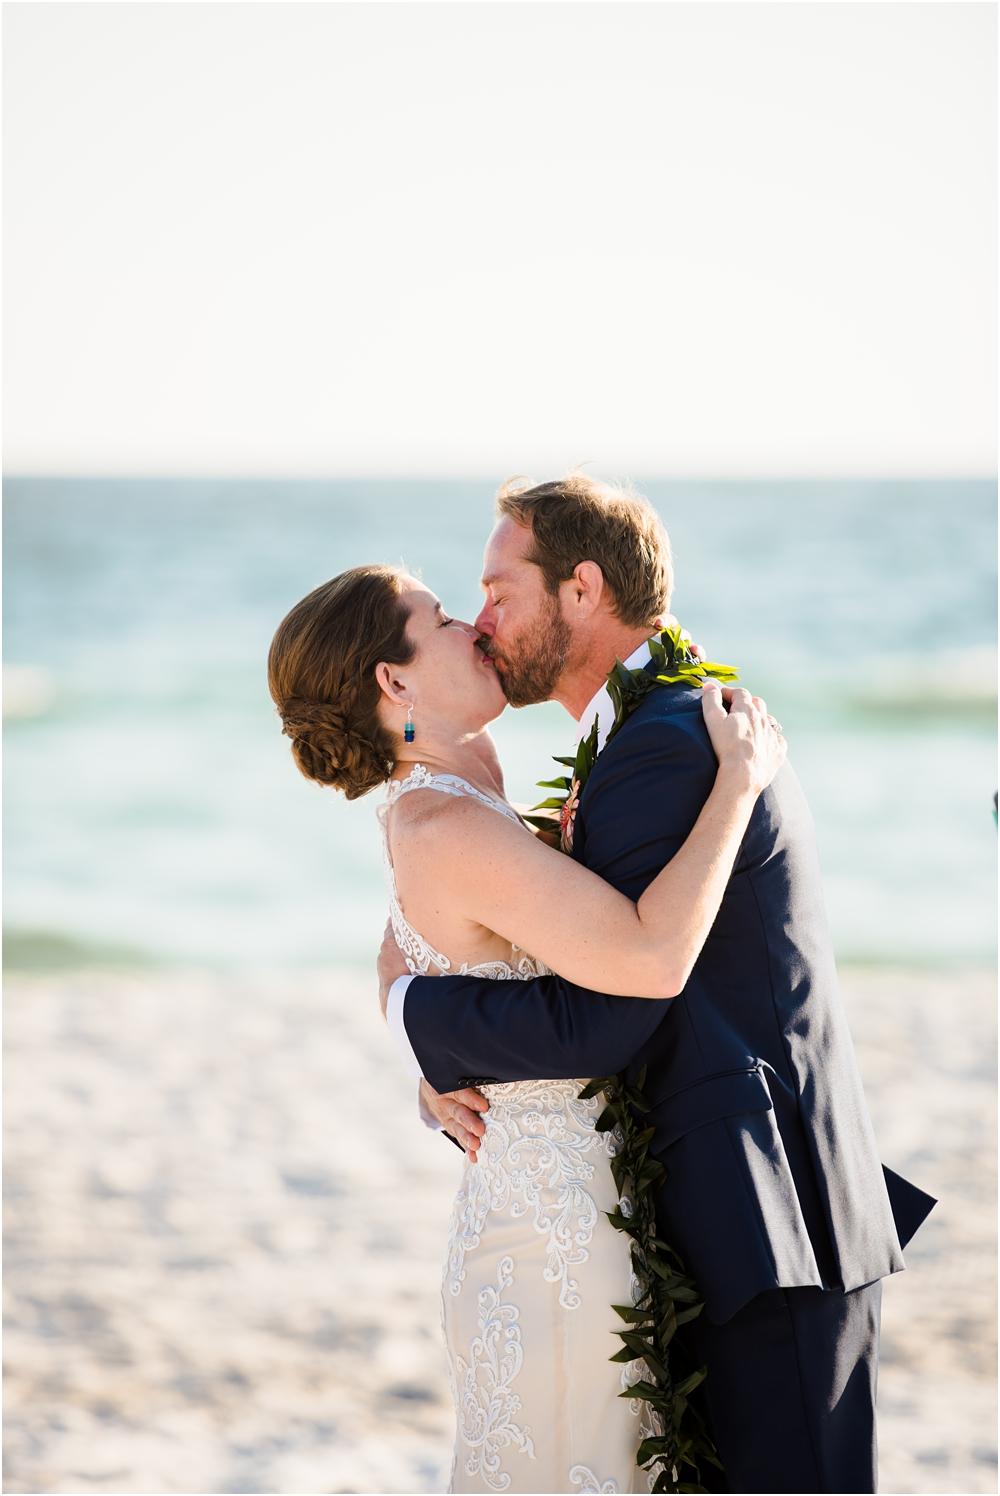 ledman-wedding-kiersten-stevenson-photography-30a-panama-city-beach-dothan-tallahassee-(241-of-763).JPG